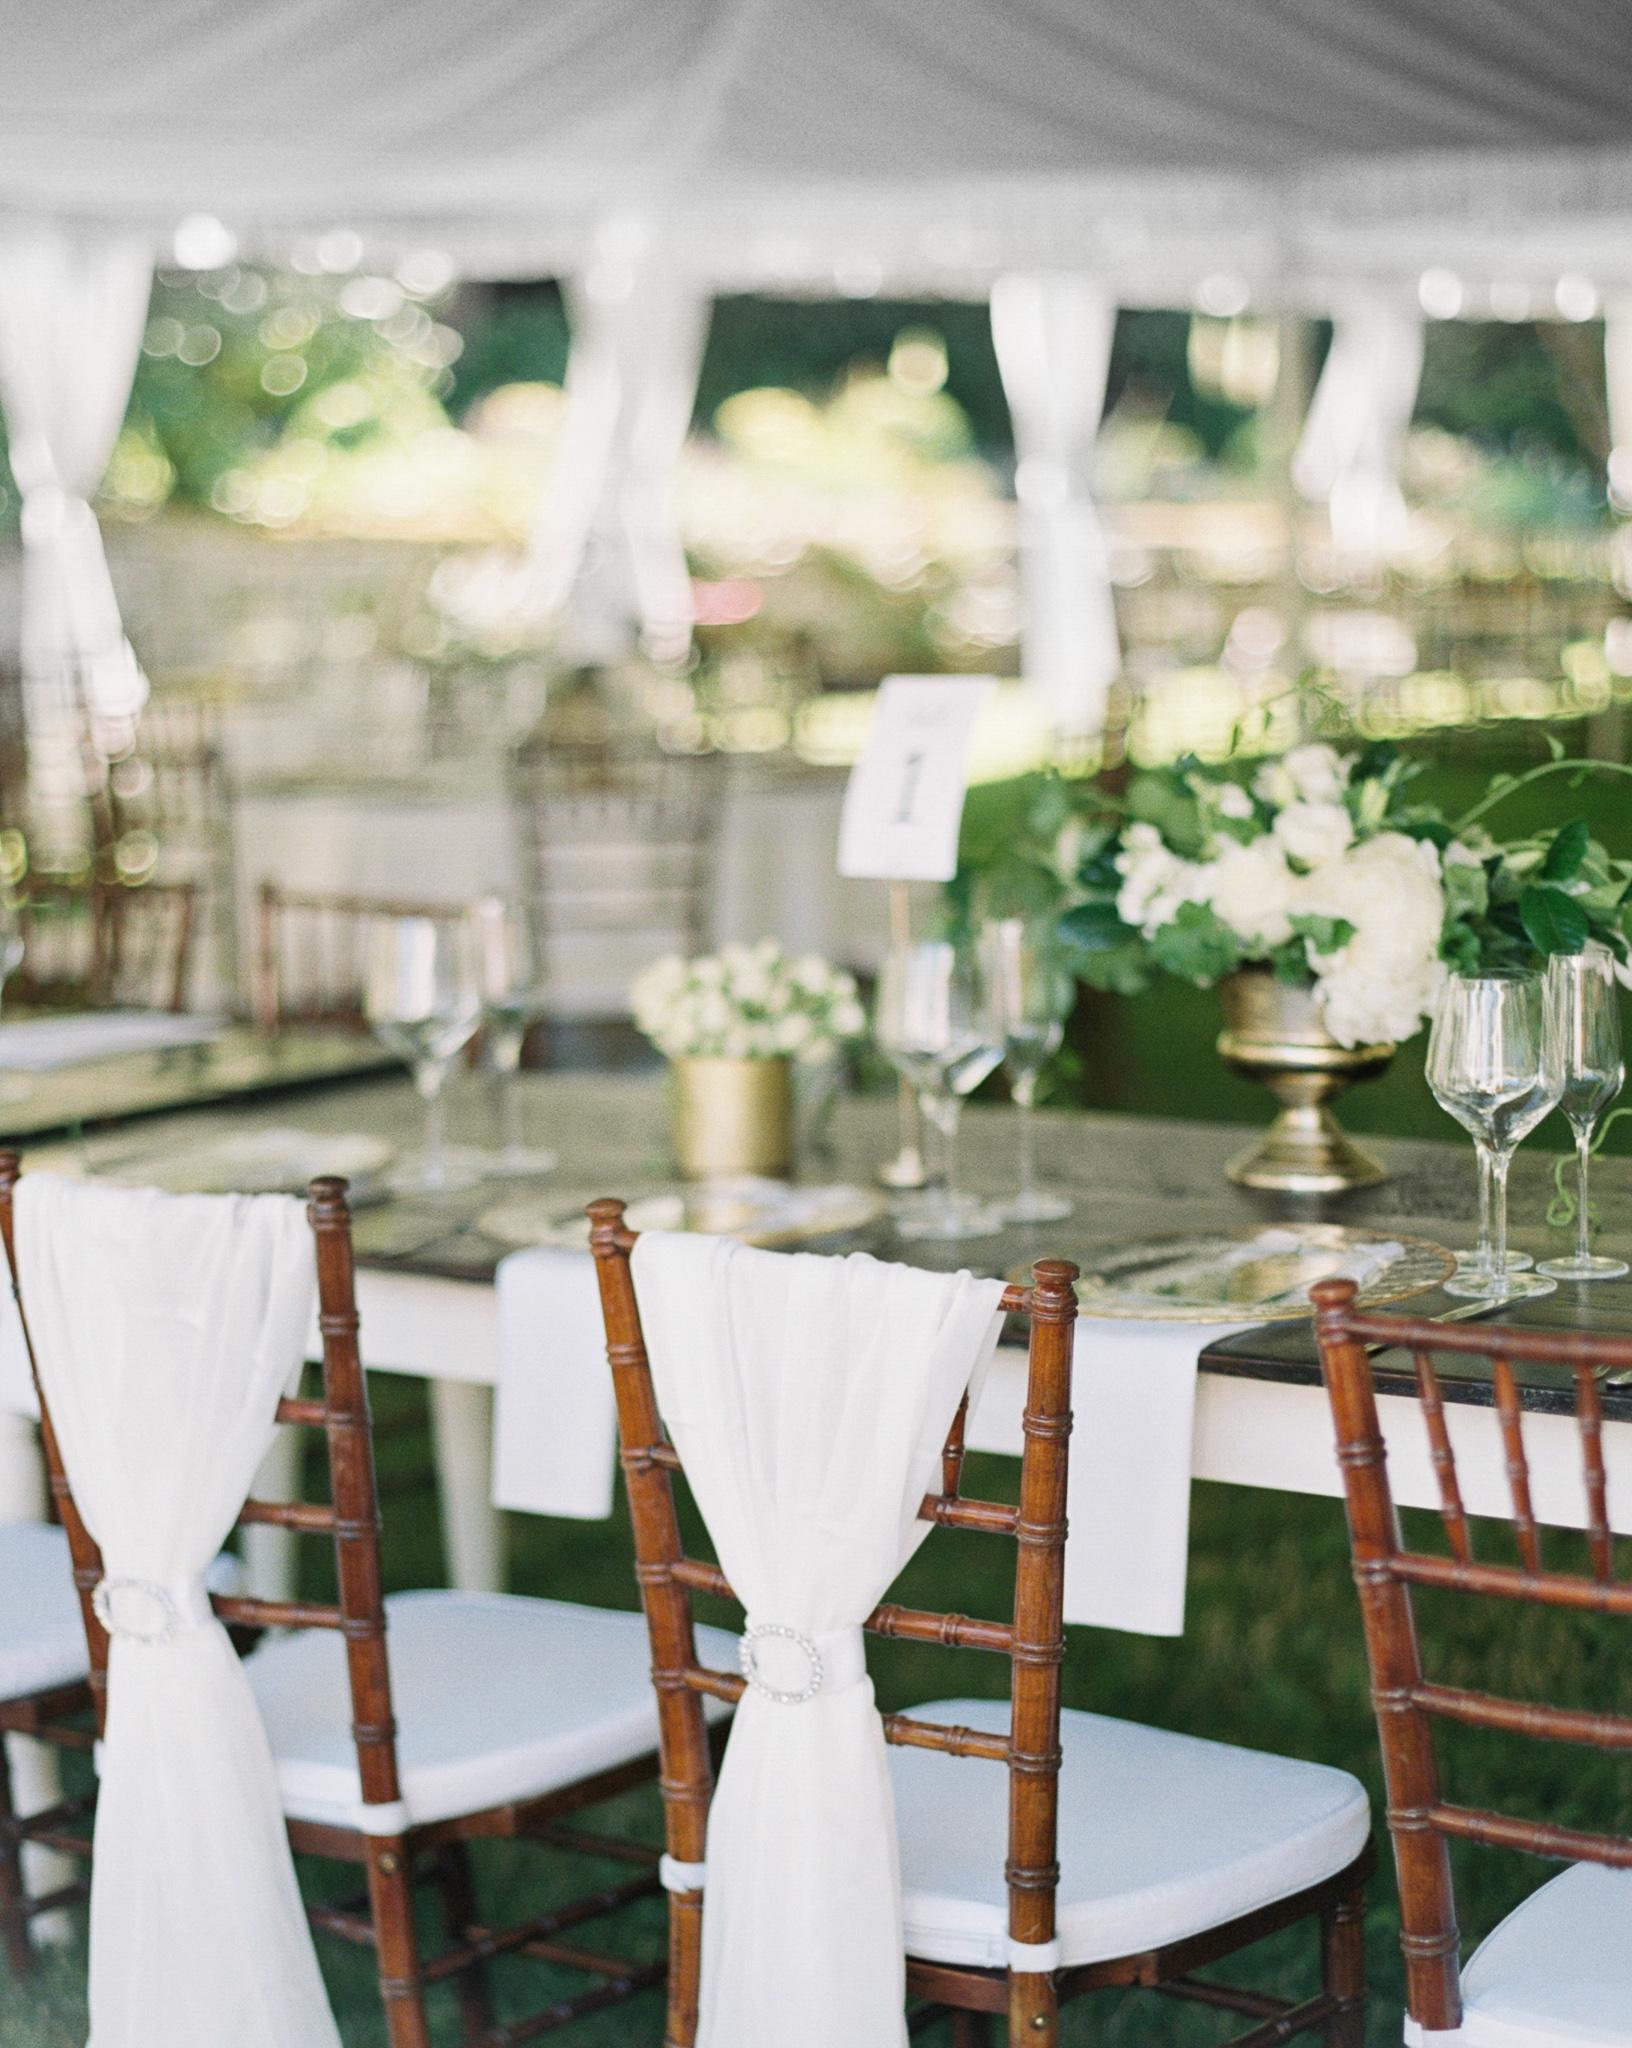 167OutliveCreative_Travel_Photographer_Videographer_Lewis&Clark_Oregon_Elegant_BlackTie_Destination_Wedding.jpg